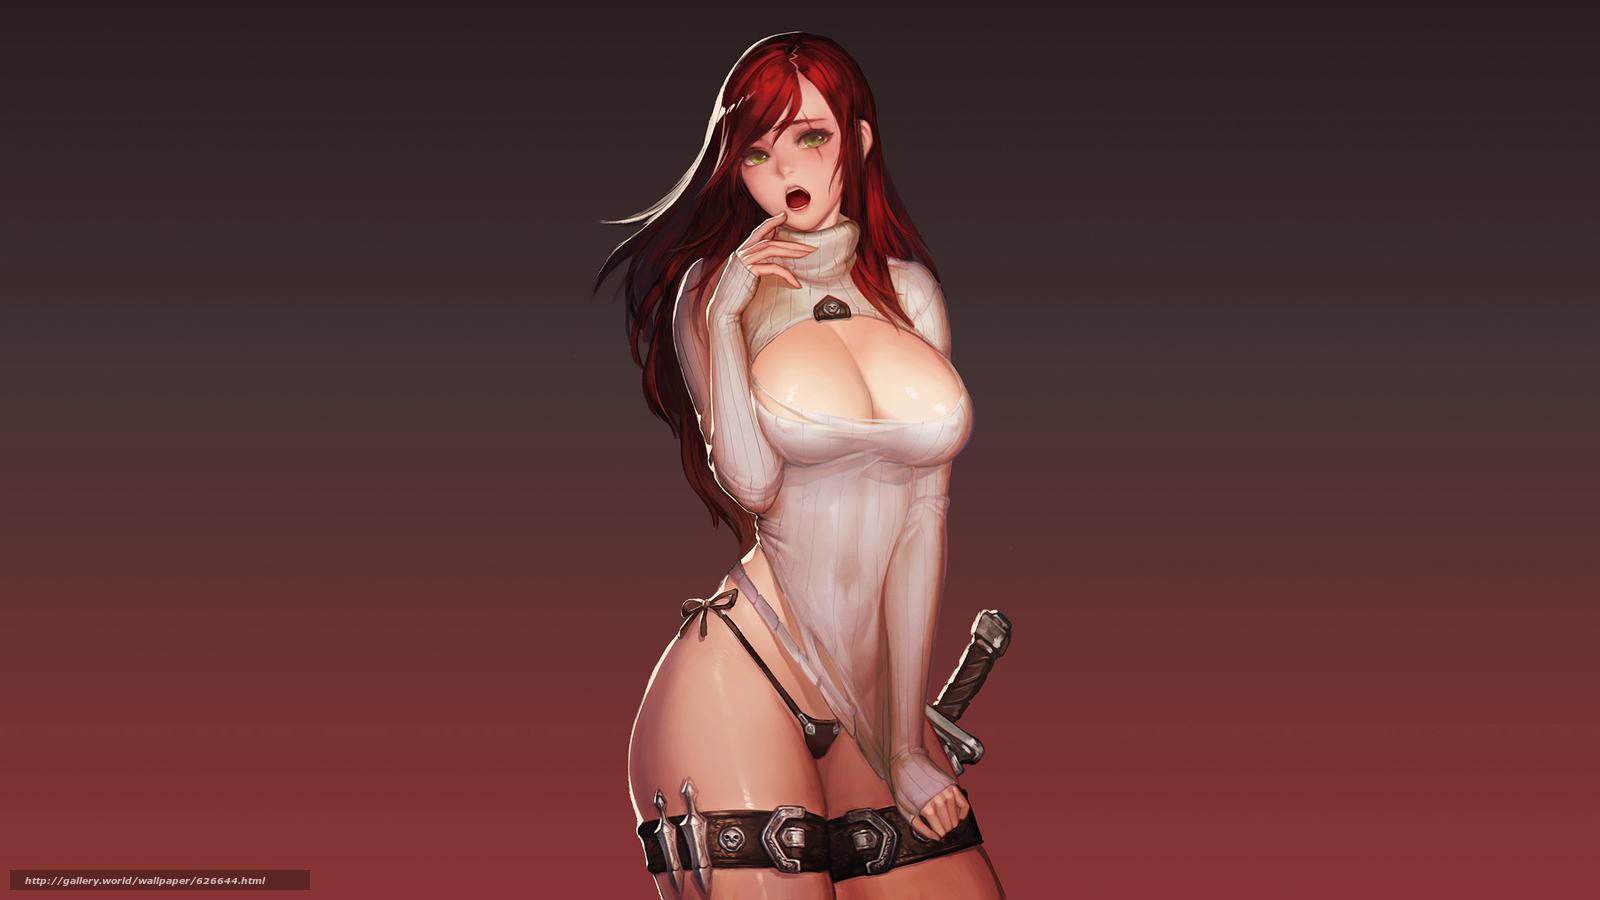 Скачать на телефон обои фото картинку на тему League of Legends, Katarina, девушка, фигура, грудь, фан-арт, разширение 2560x1440